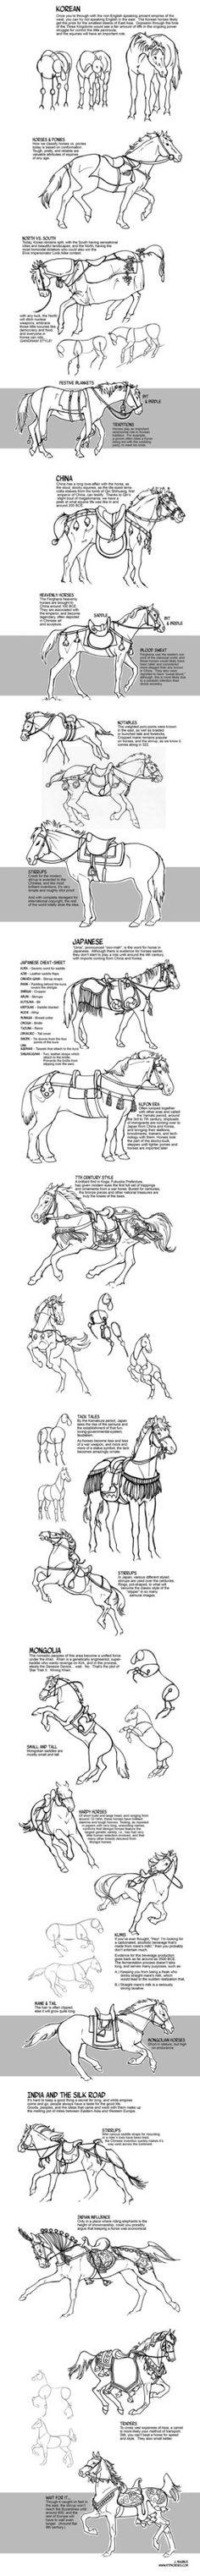 Historic Asian Horses by sketcherjak on DeviantArt